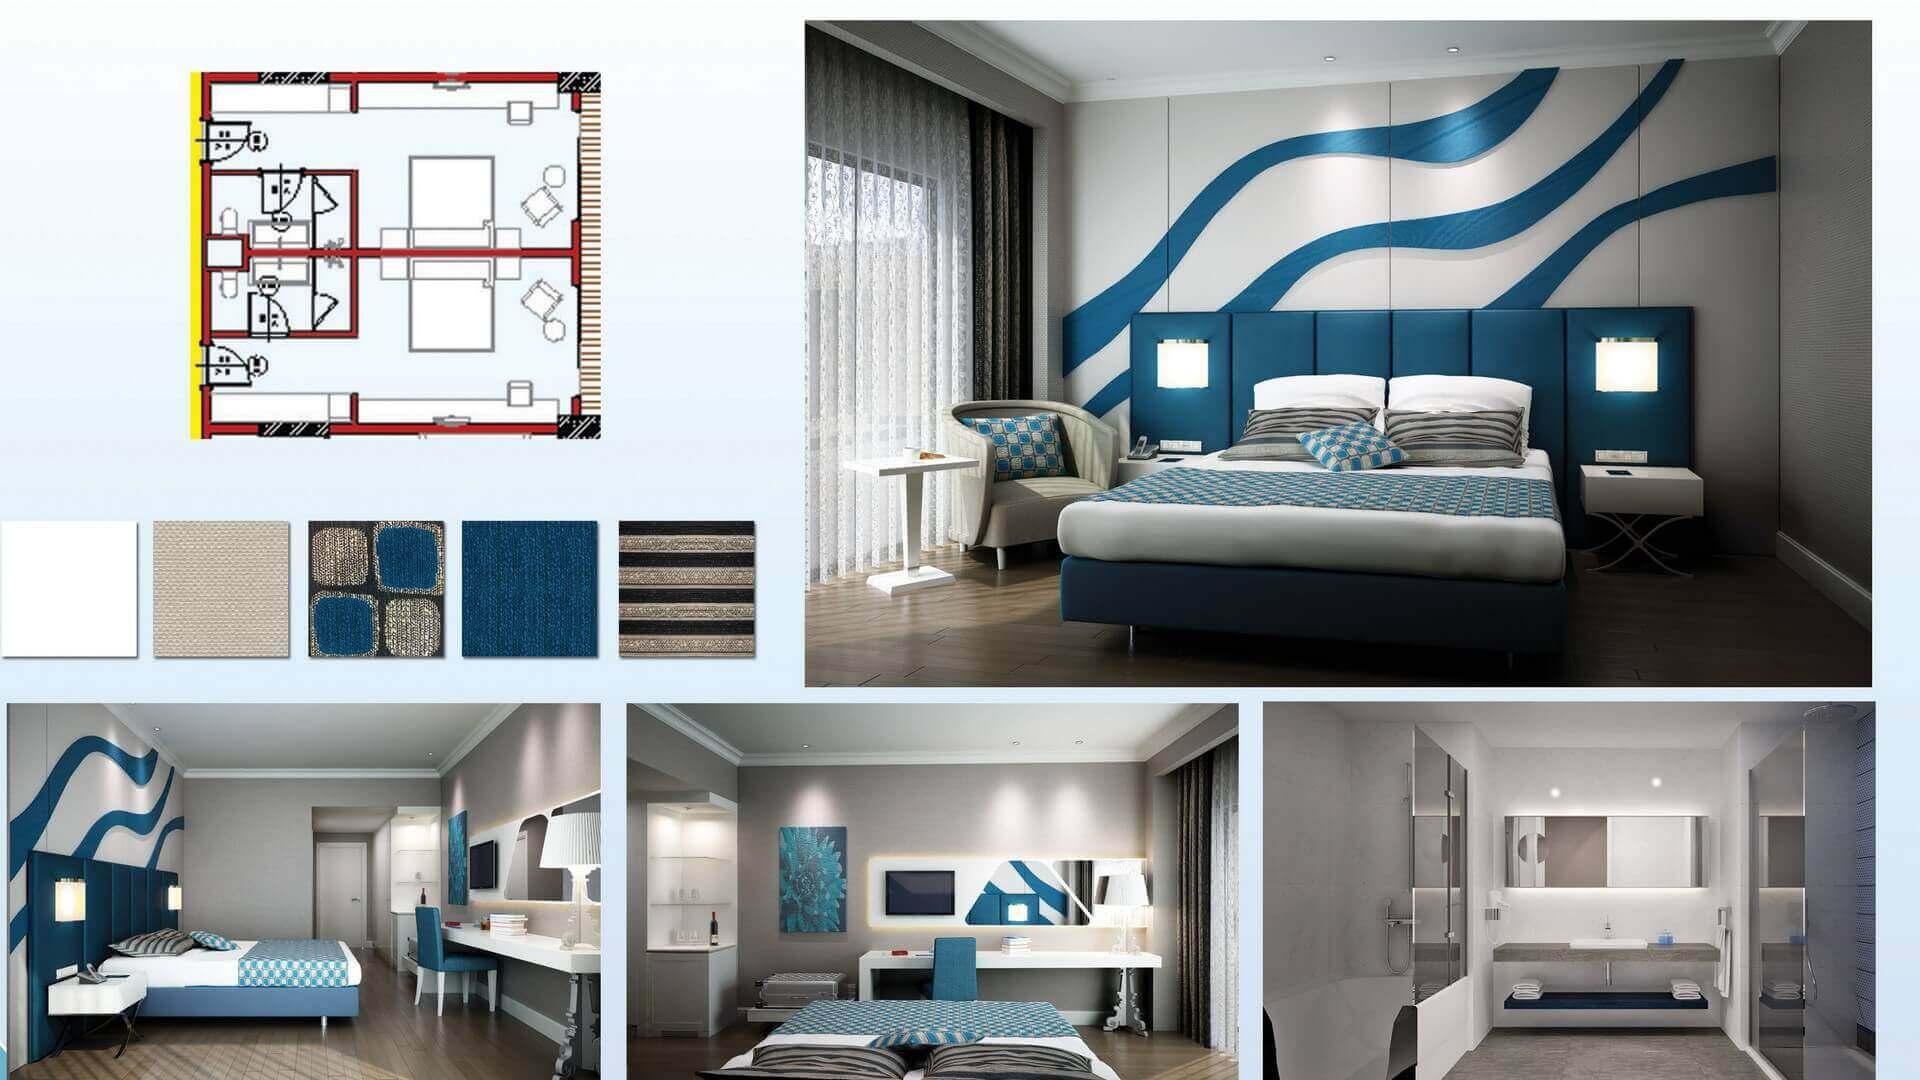 Reception 2141 Arbil Sheraton, IRAQ Hotels